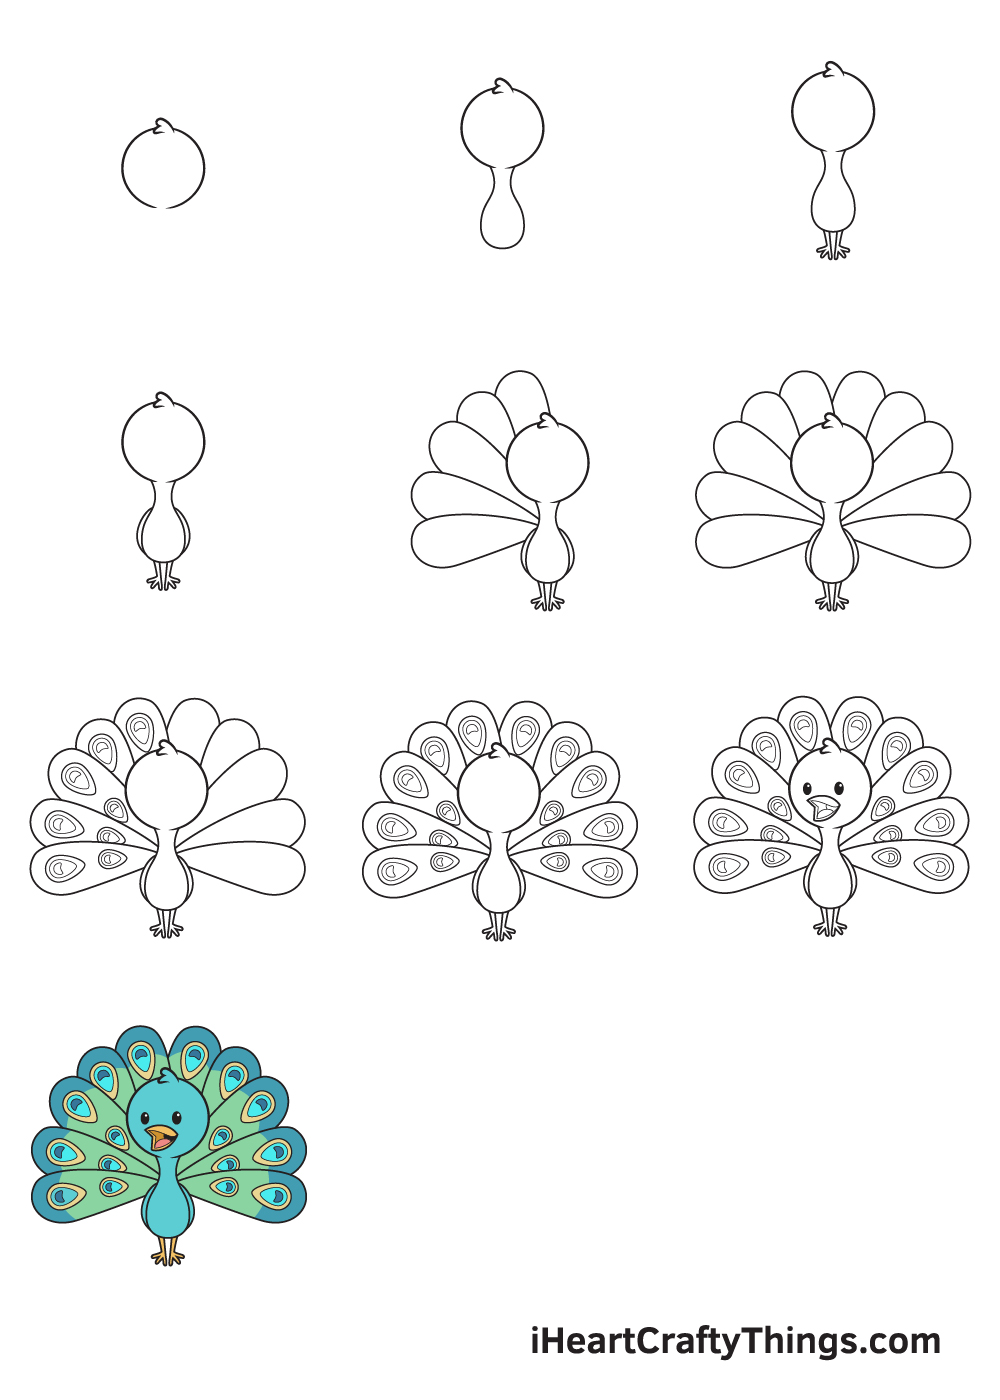 drawing peacock in 9 easy steps